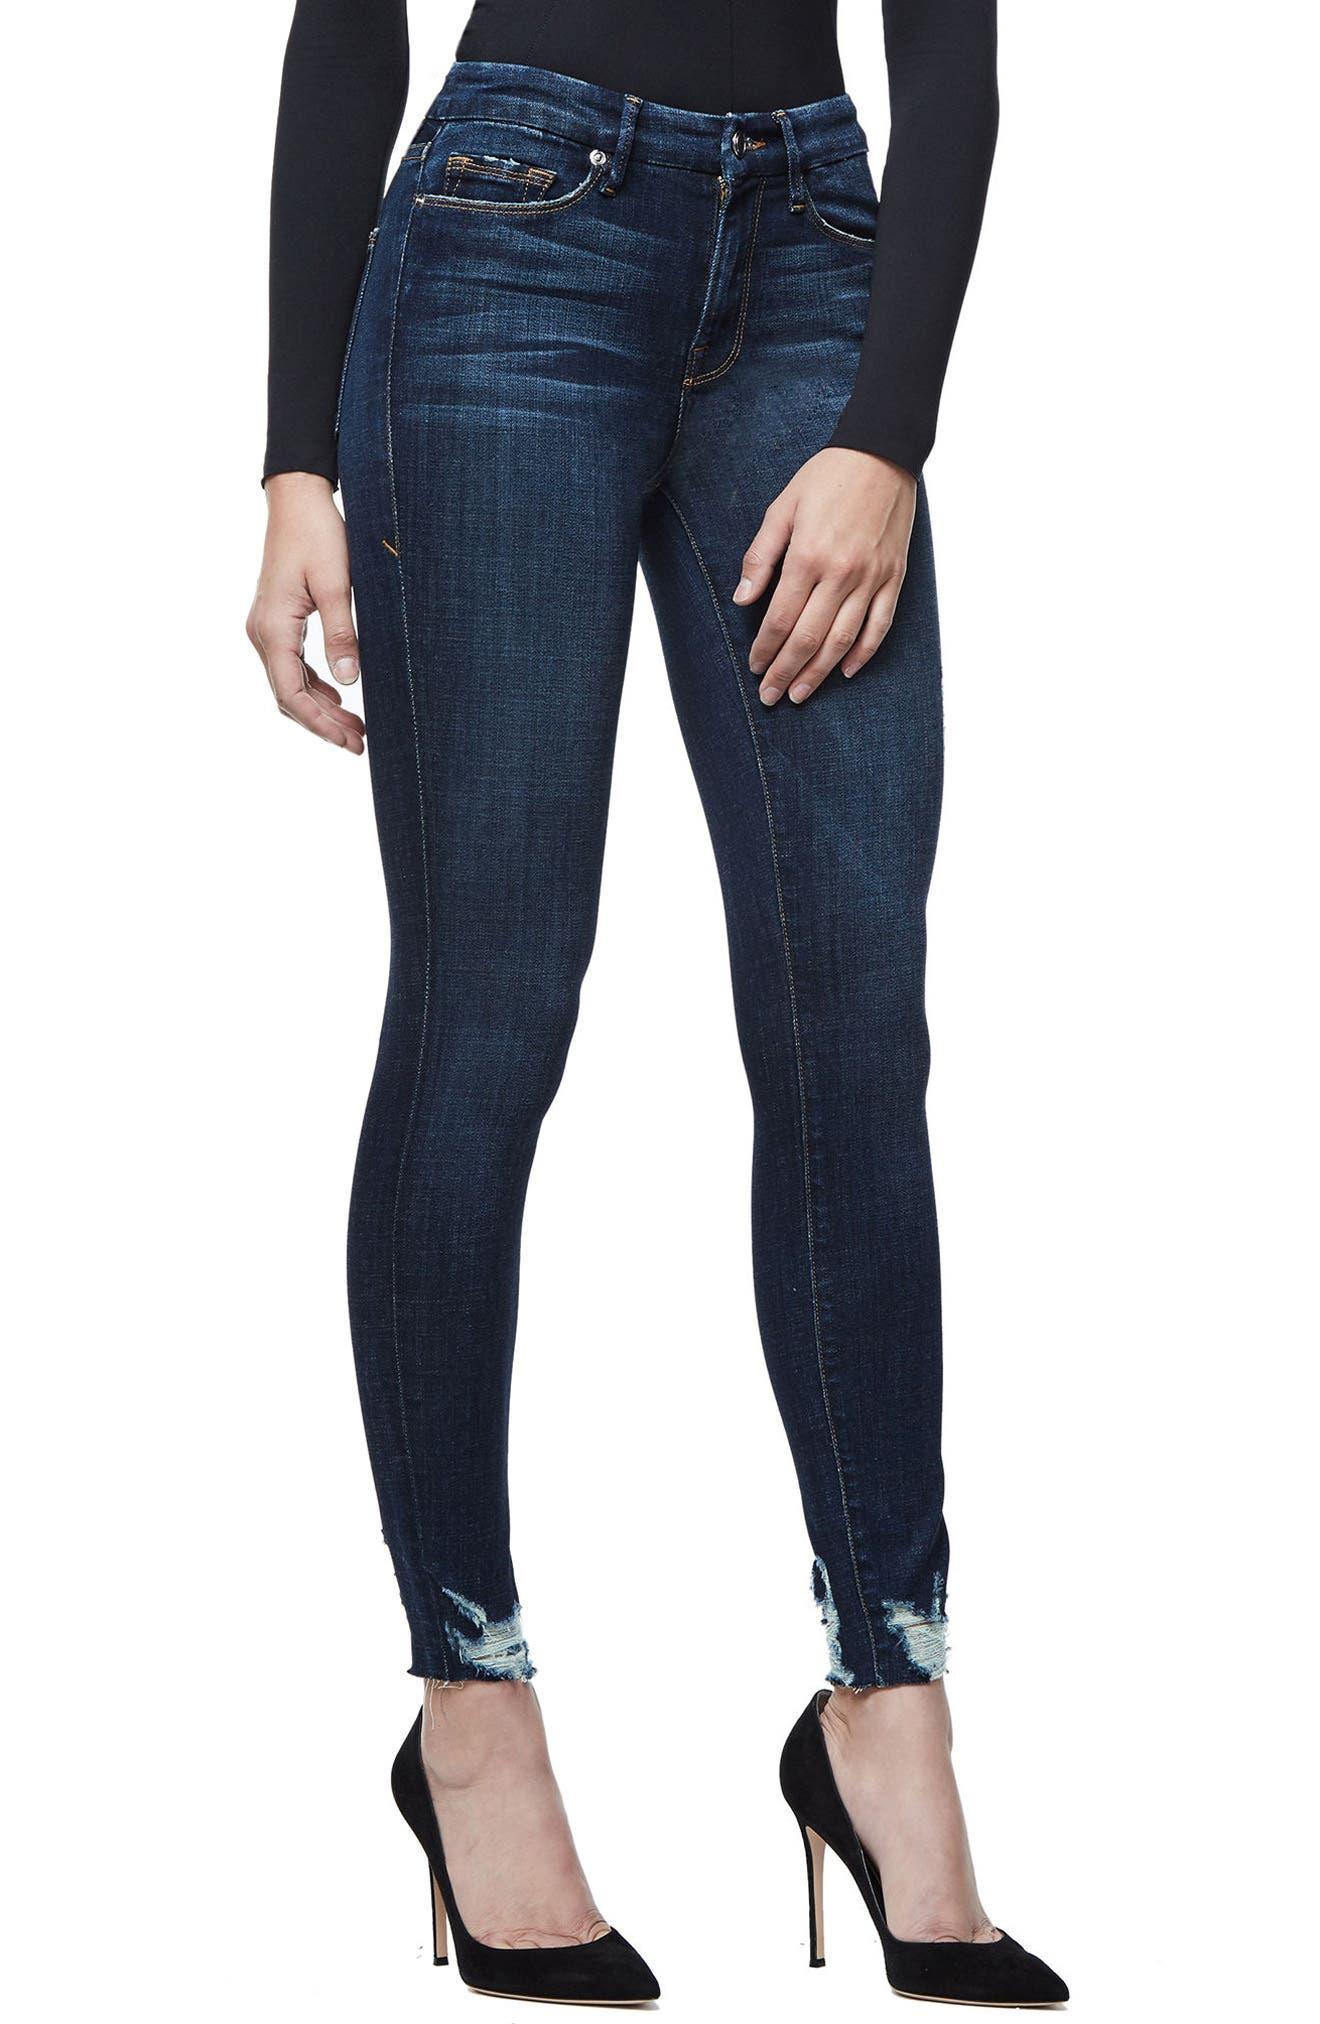 Alternate Image 3  - Good American Good Legs Raw Hem Skinny Jeans (Blue 080) (Extended Sizes)